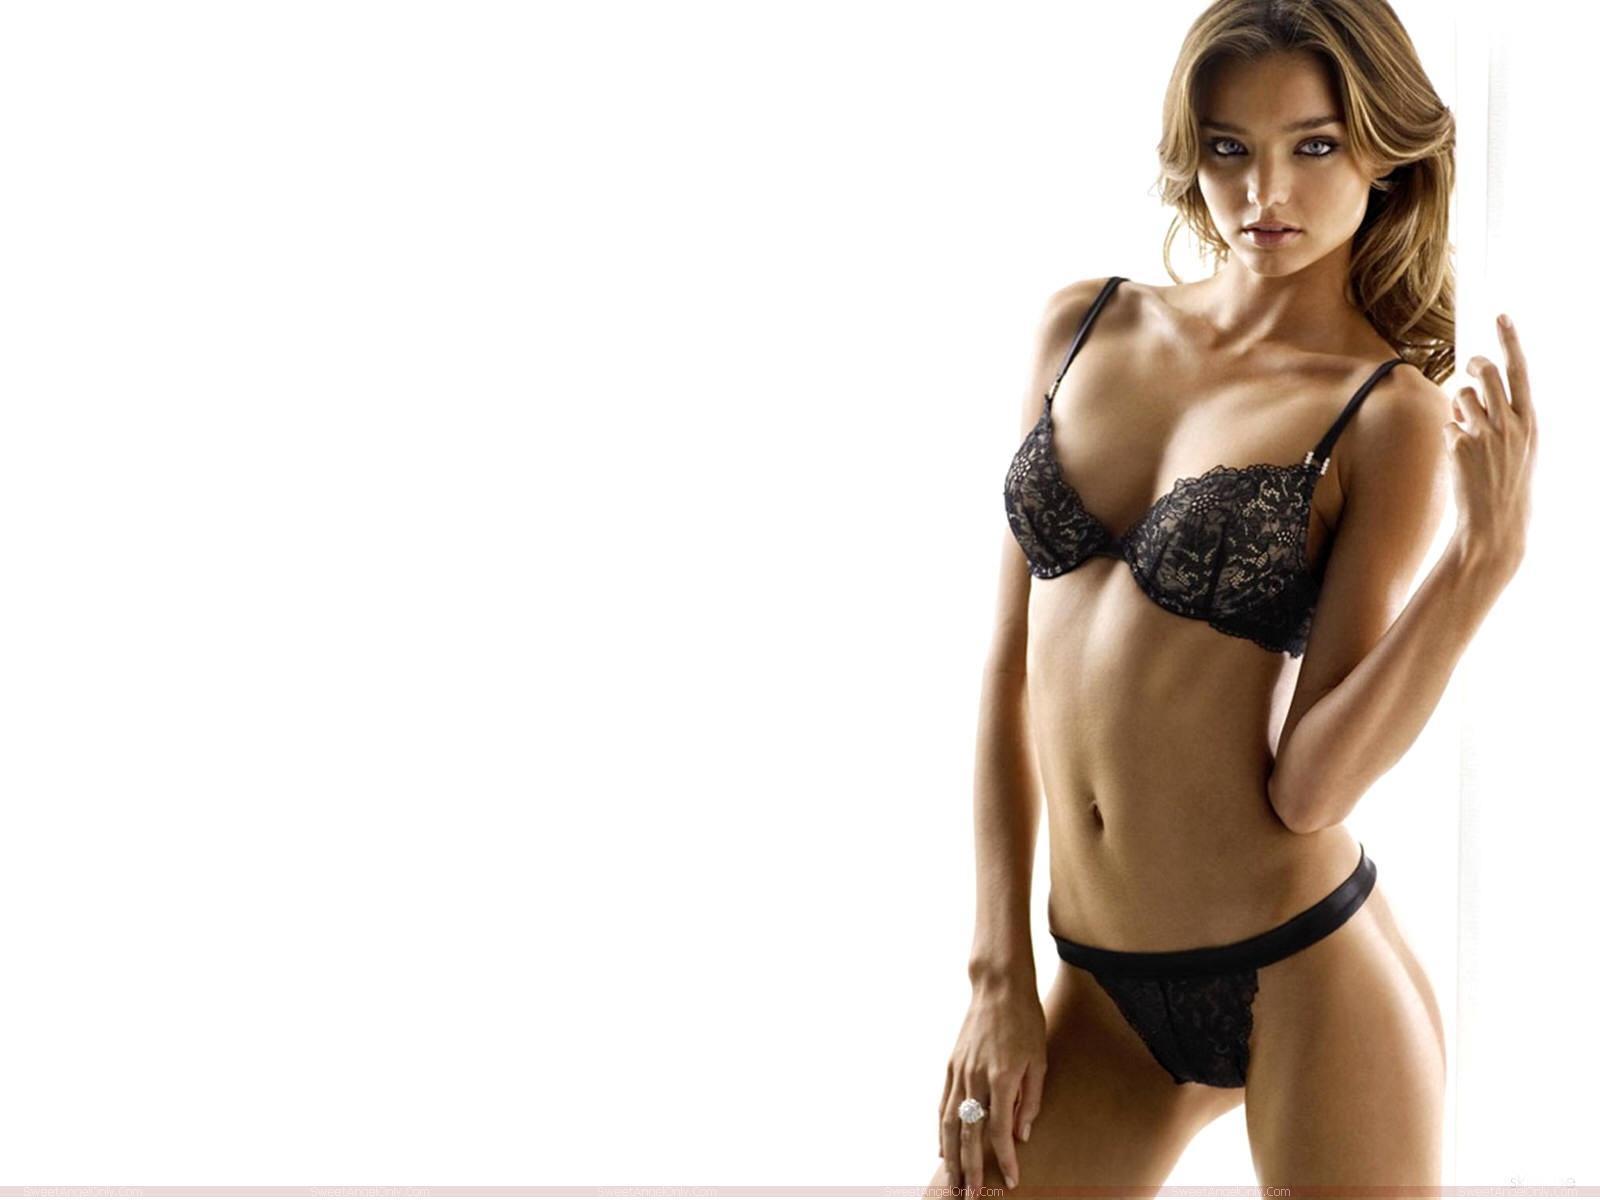 http://2.bp.blogspot.com/-f_8cBJUyaZ4/UFFa4PAt-EI/AAAAAAAADOY/5GJEjIEjgTc/s1600/Miranda+Kerr+Model+-+Sexy+And+Cool+(2).jpg